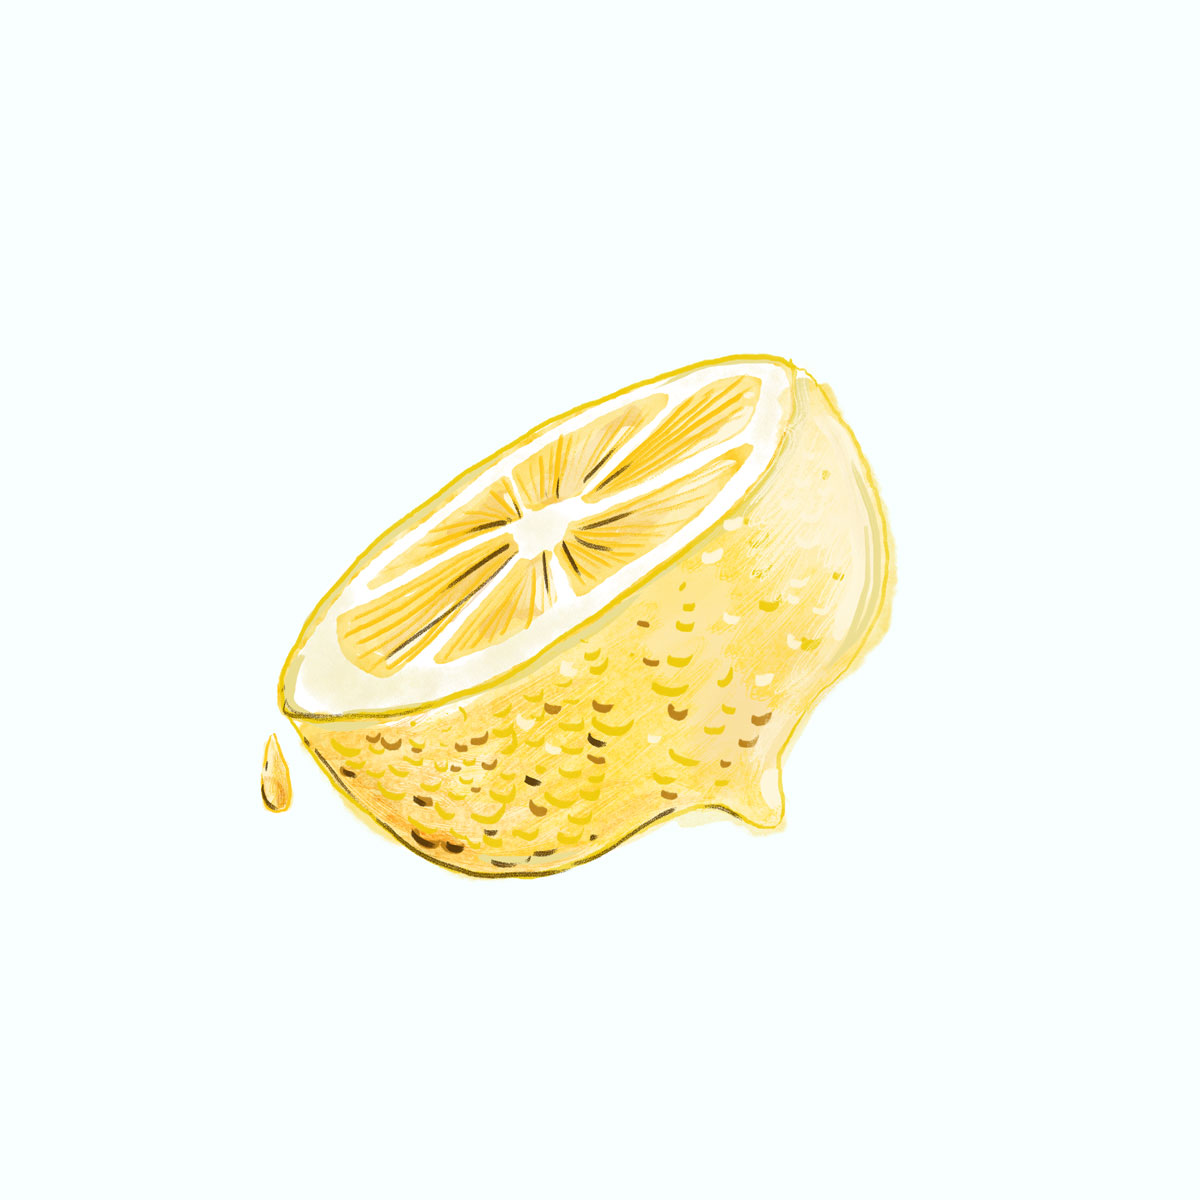 022-Lemon.jpg